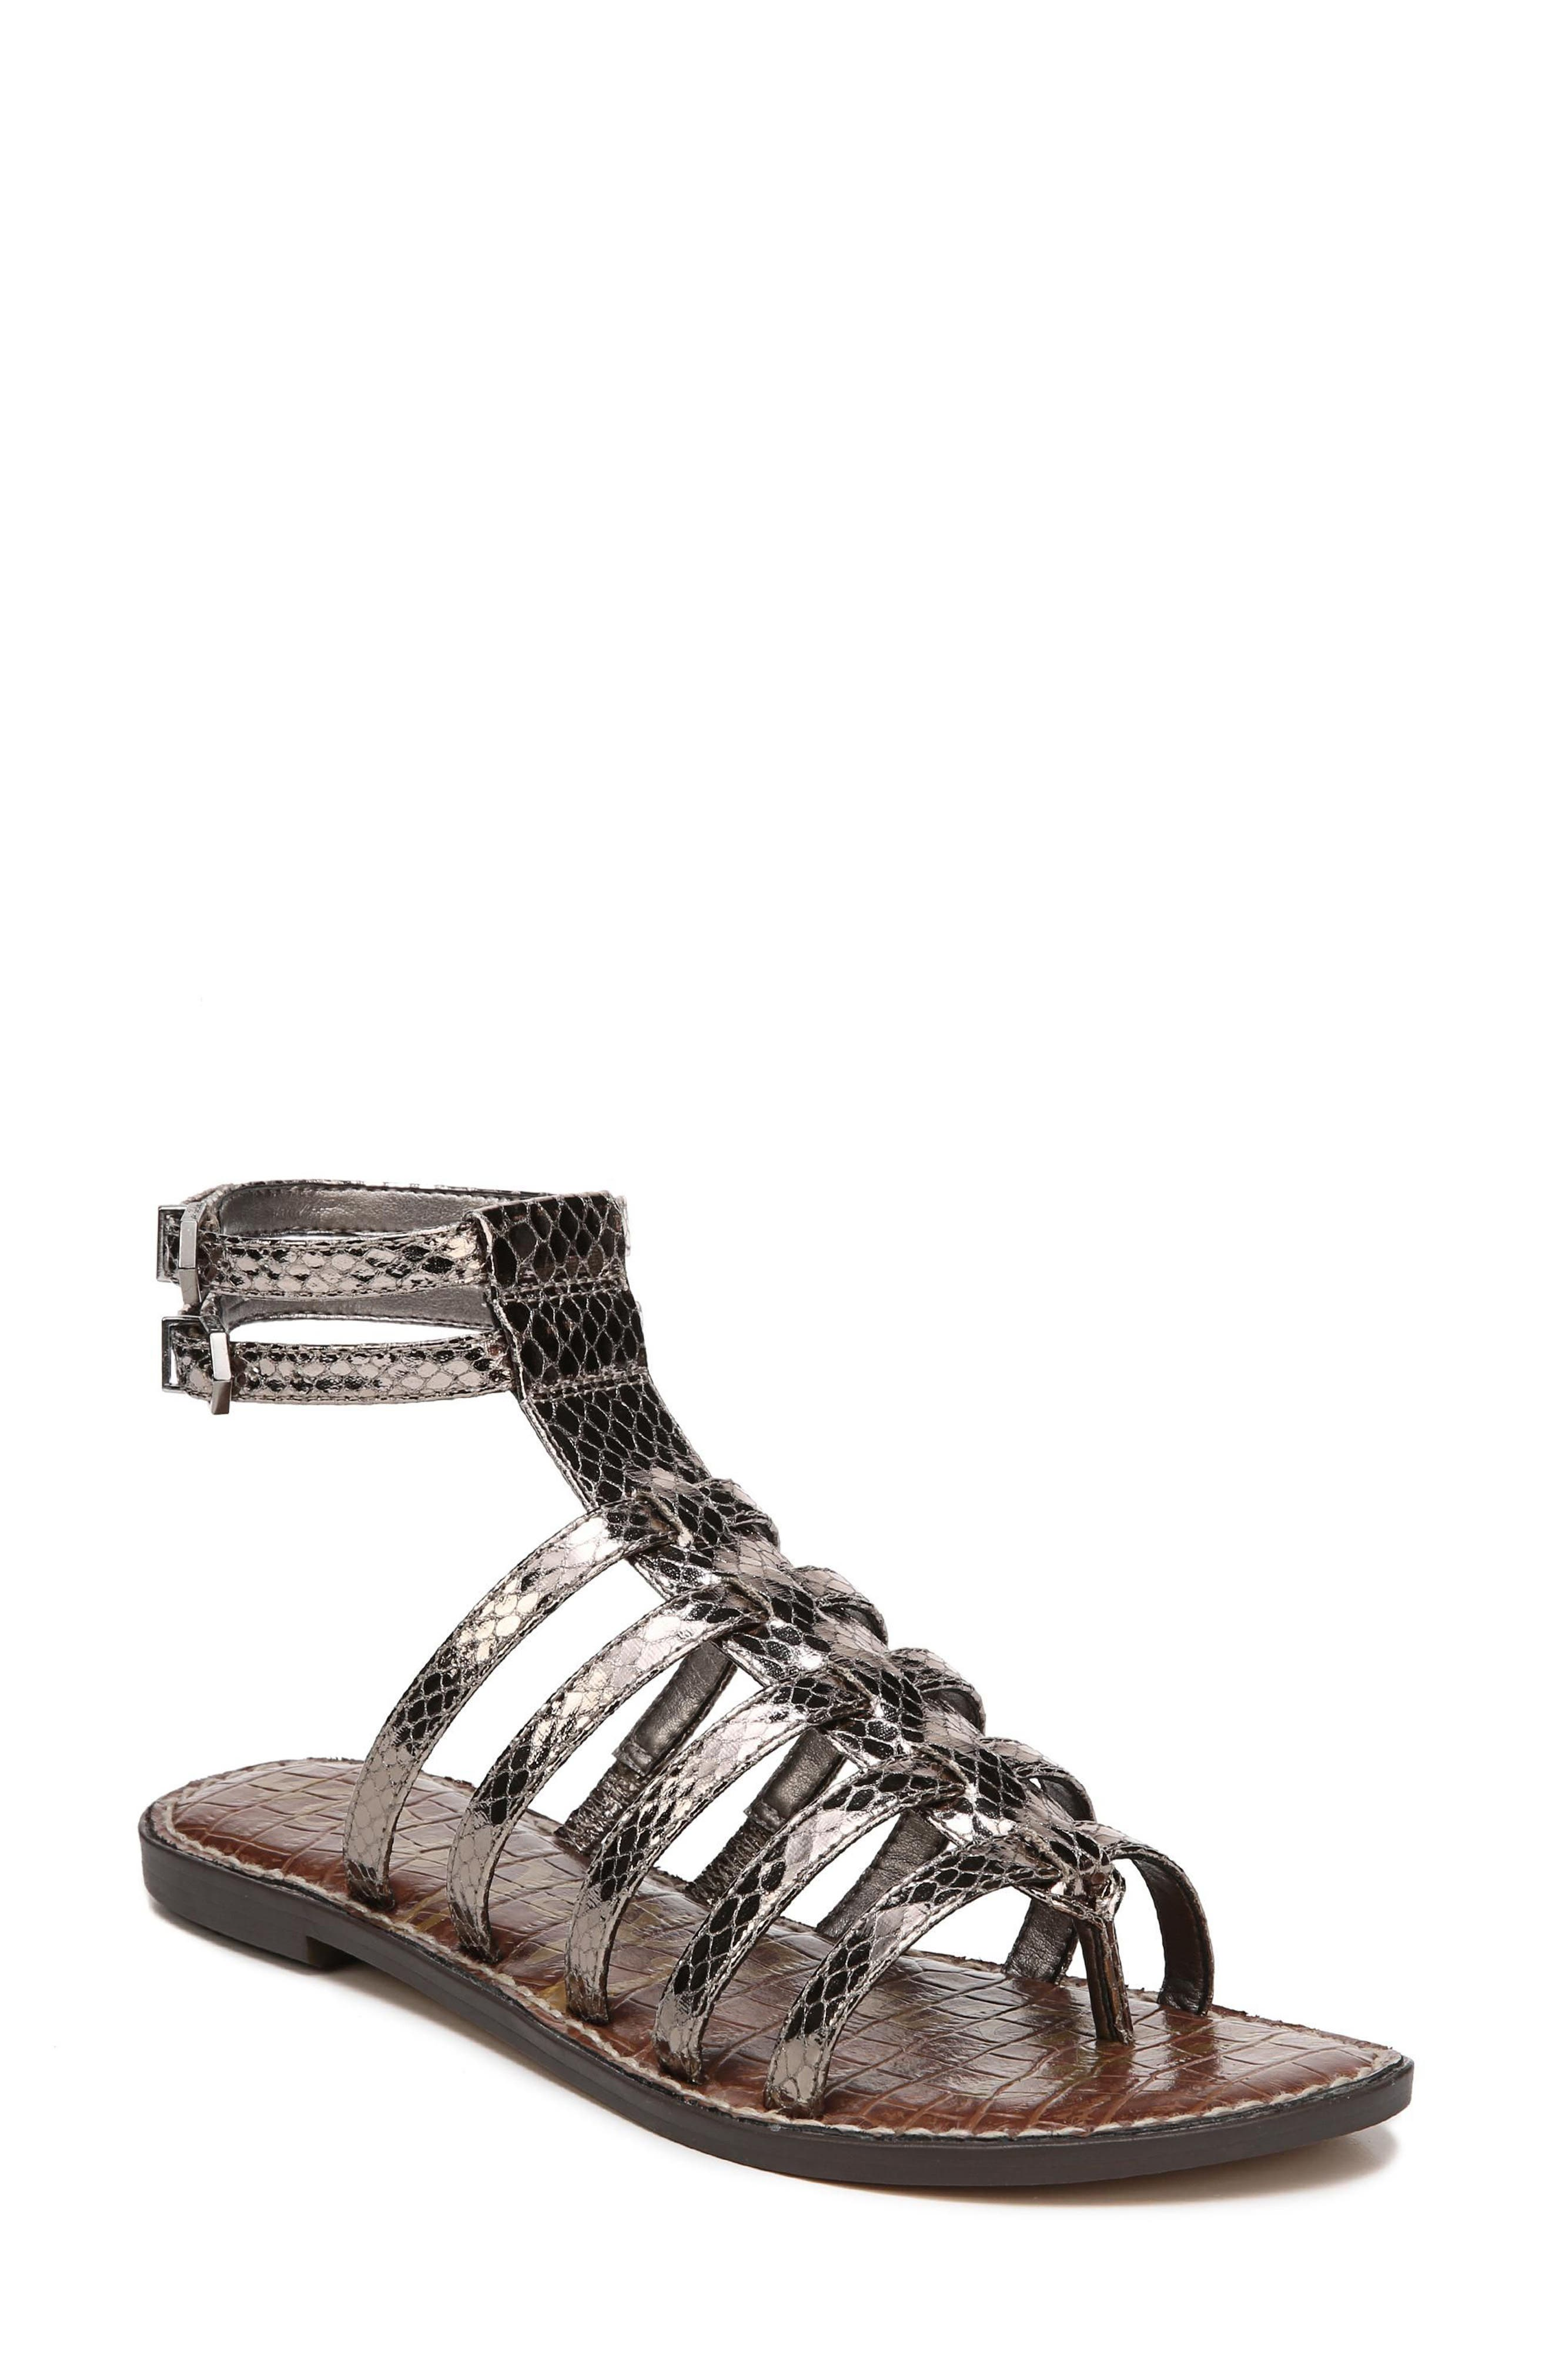 Sam Edelman 'Gilda' Gladiator Sandal